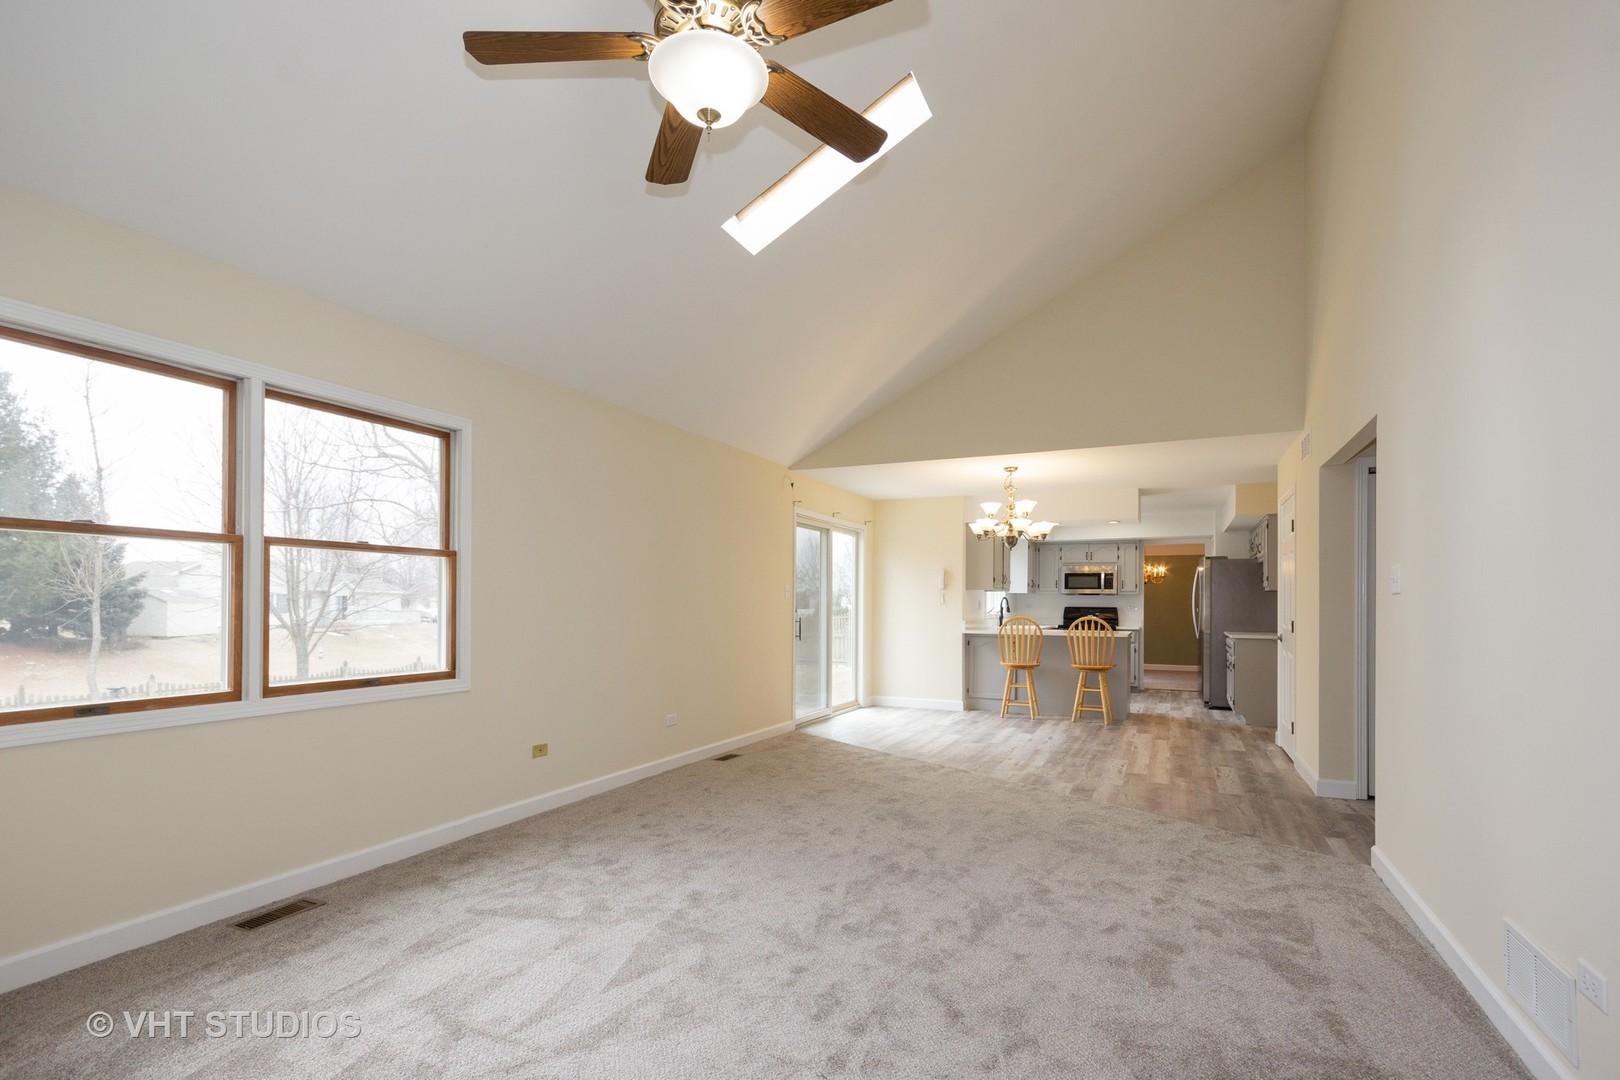 24221 South Cree, Channahon, Illinois, 60410